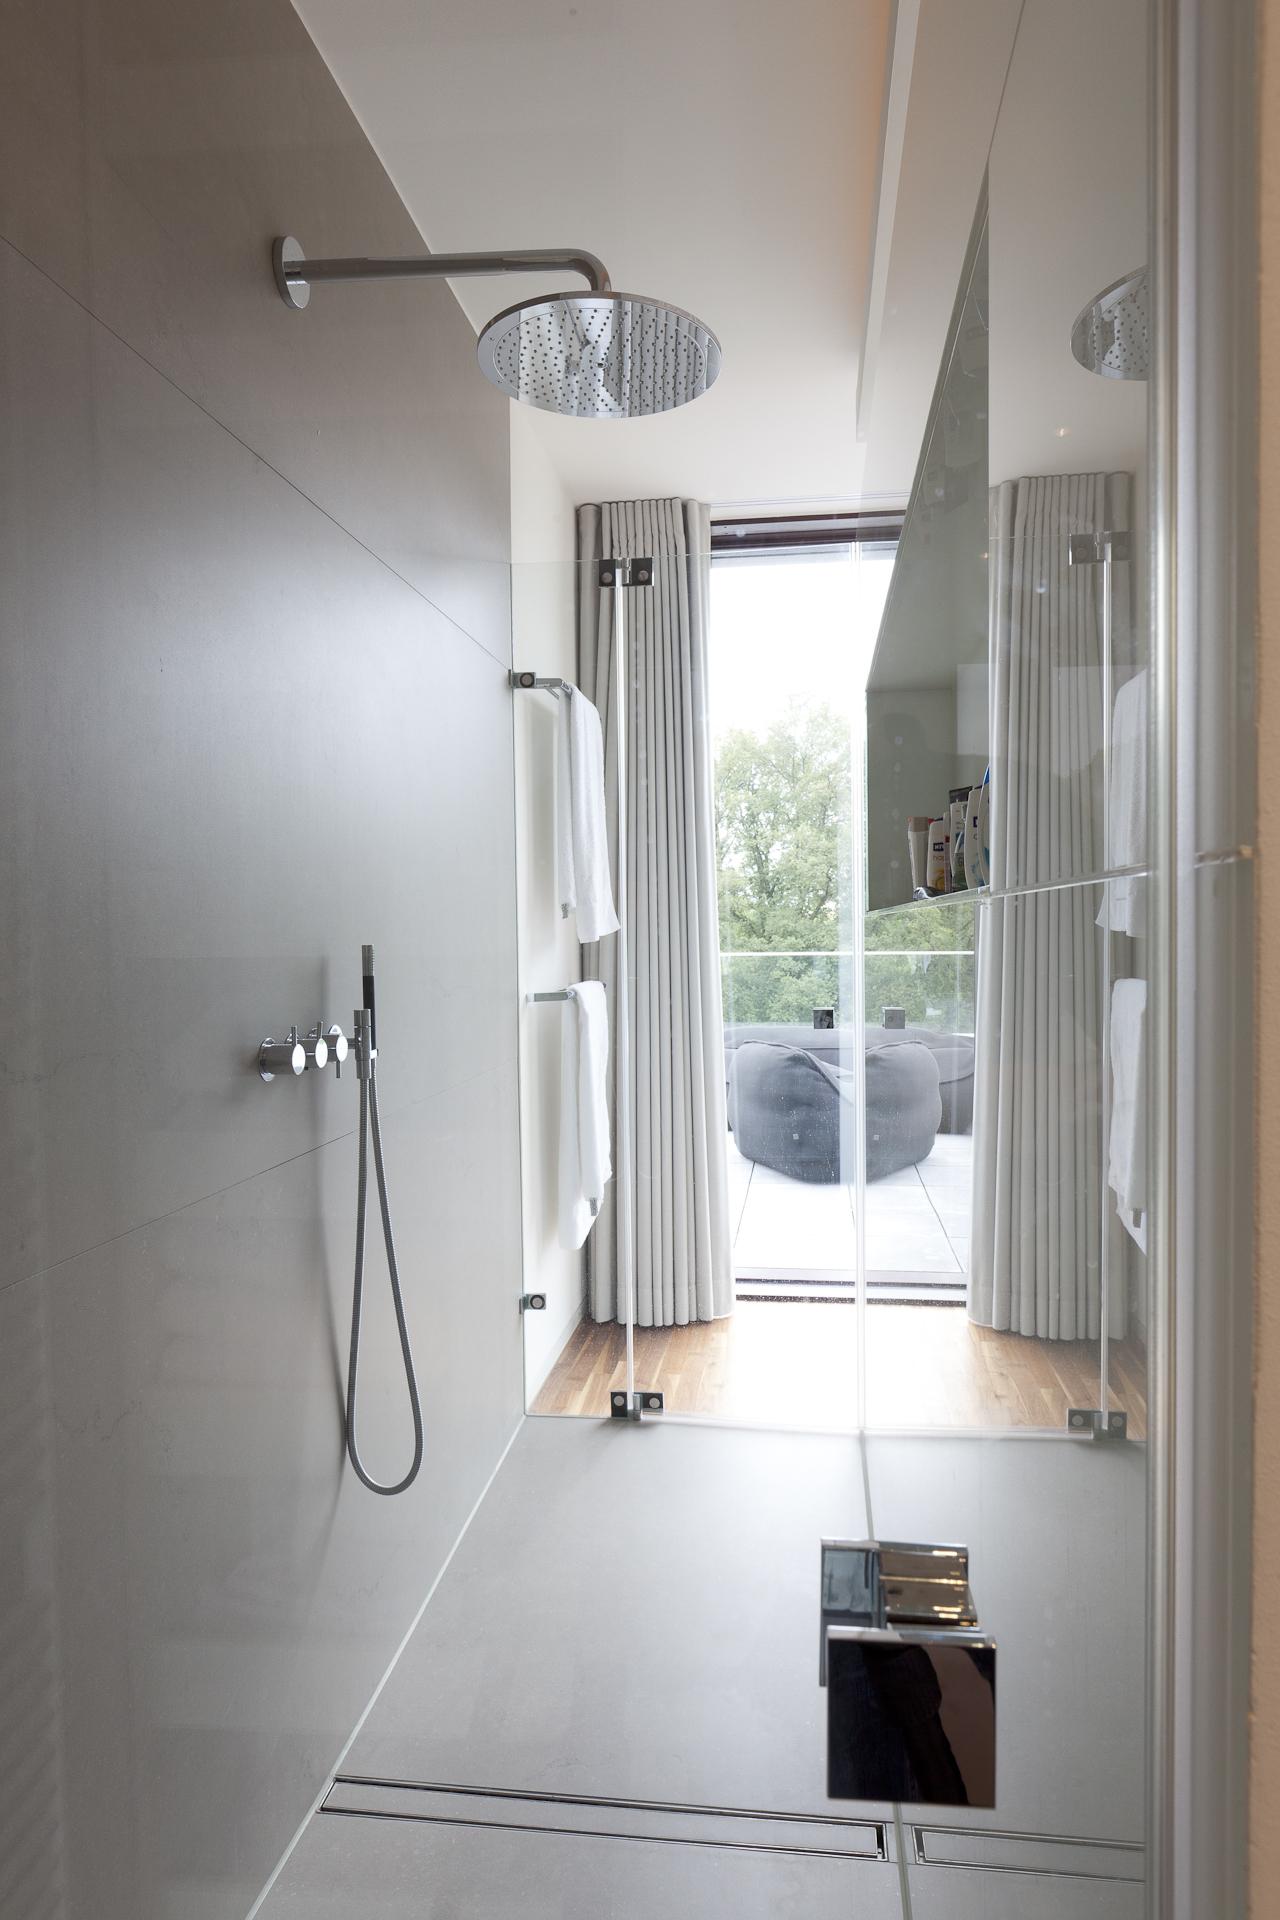 Peter_Leenders_Fotografie_Wrede_Architekten-18